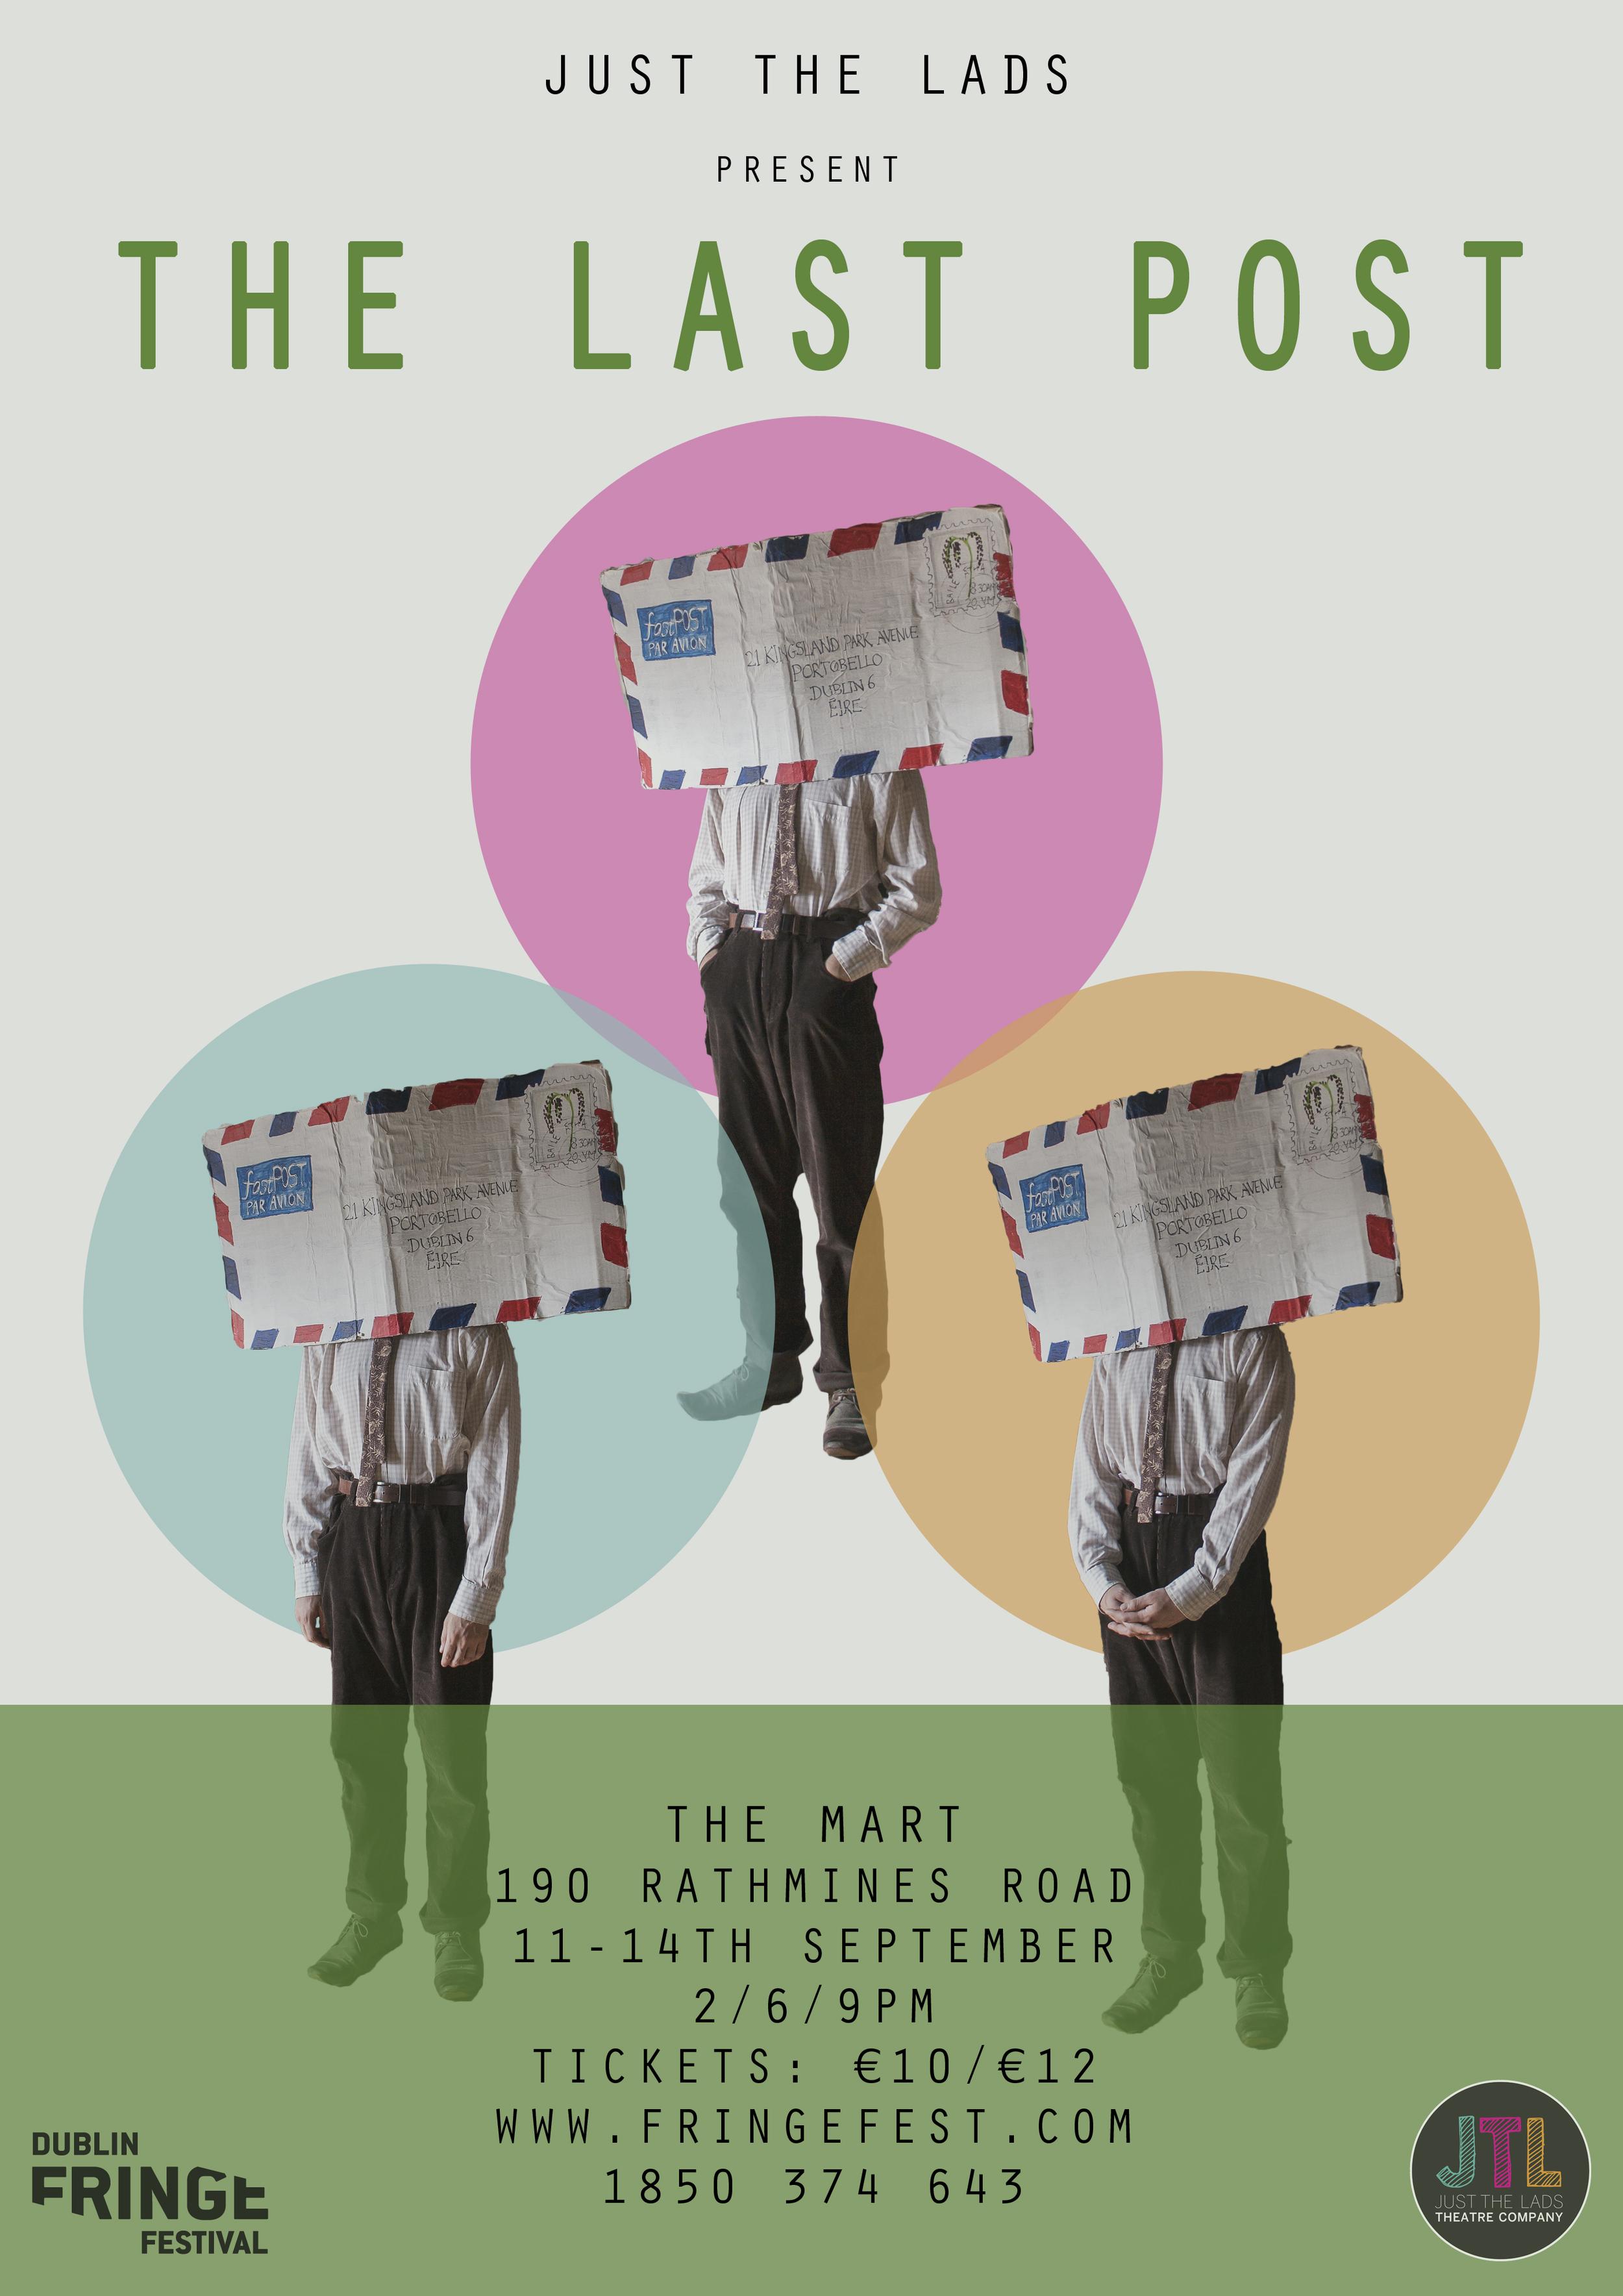 The Last Post (2013)